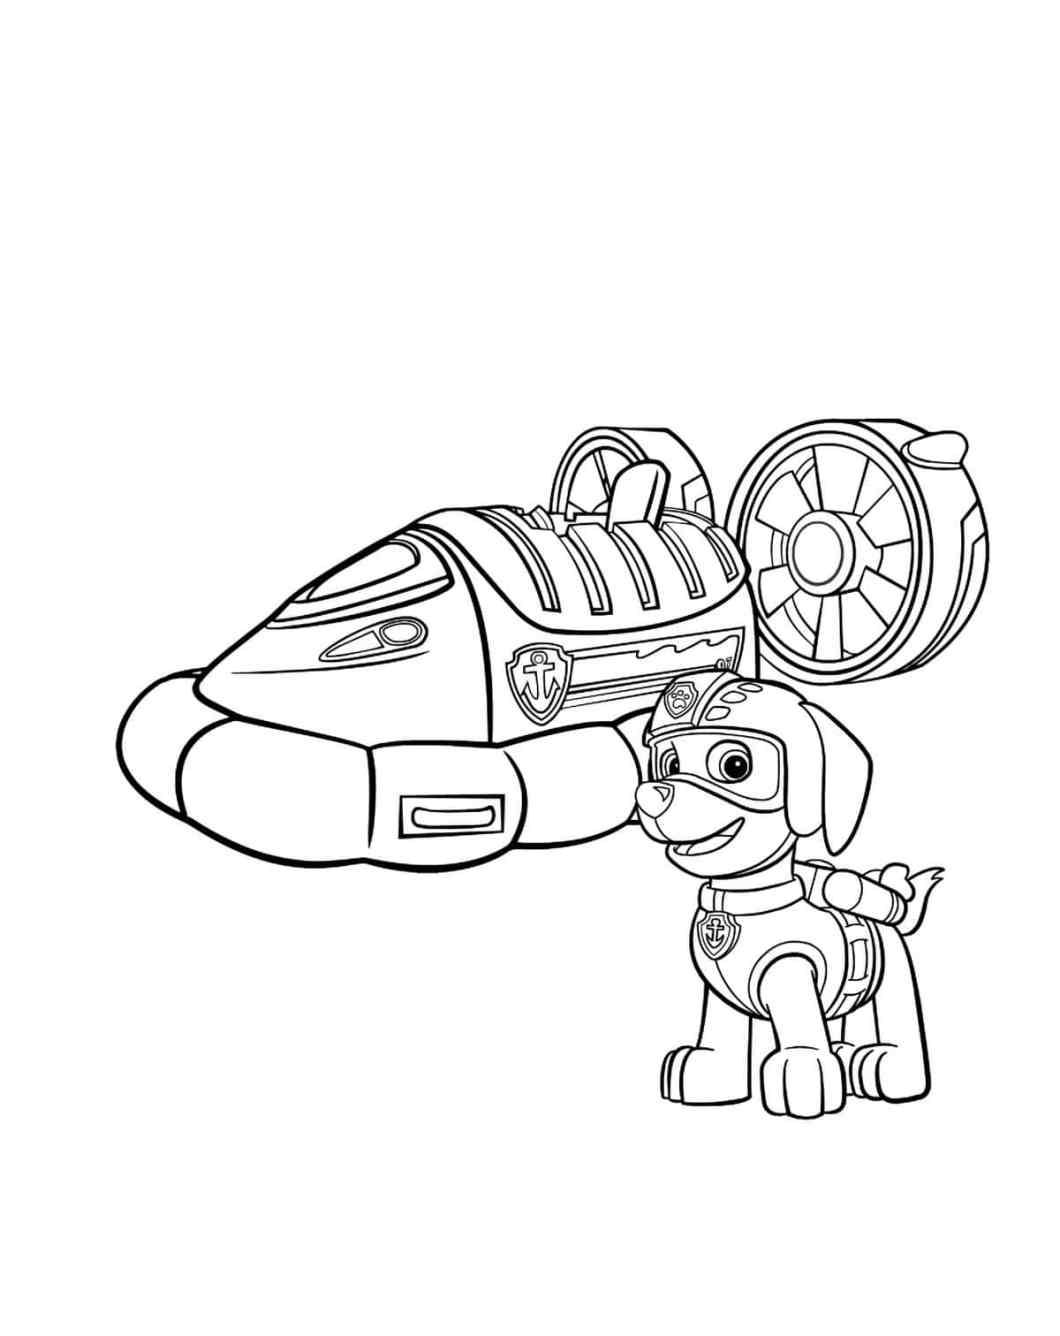 Desenhos Para Colorir Patrulha Canina Online